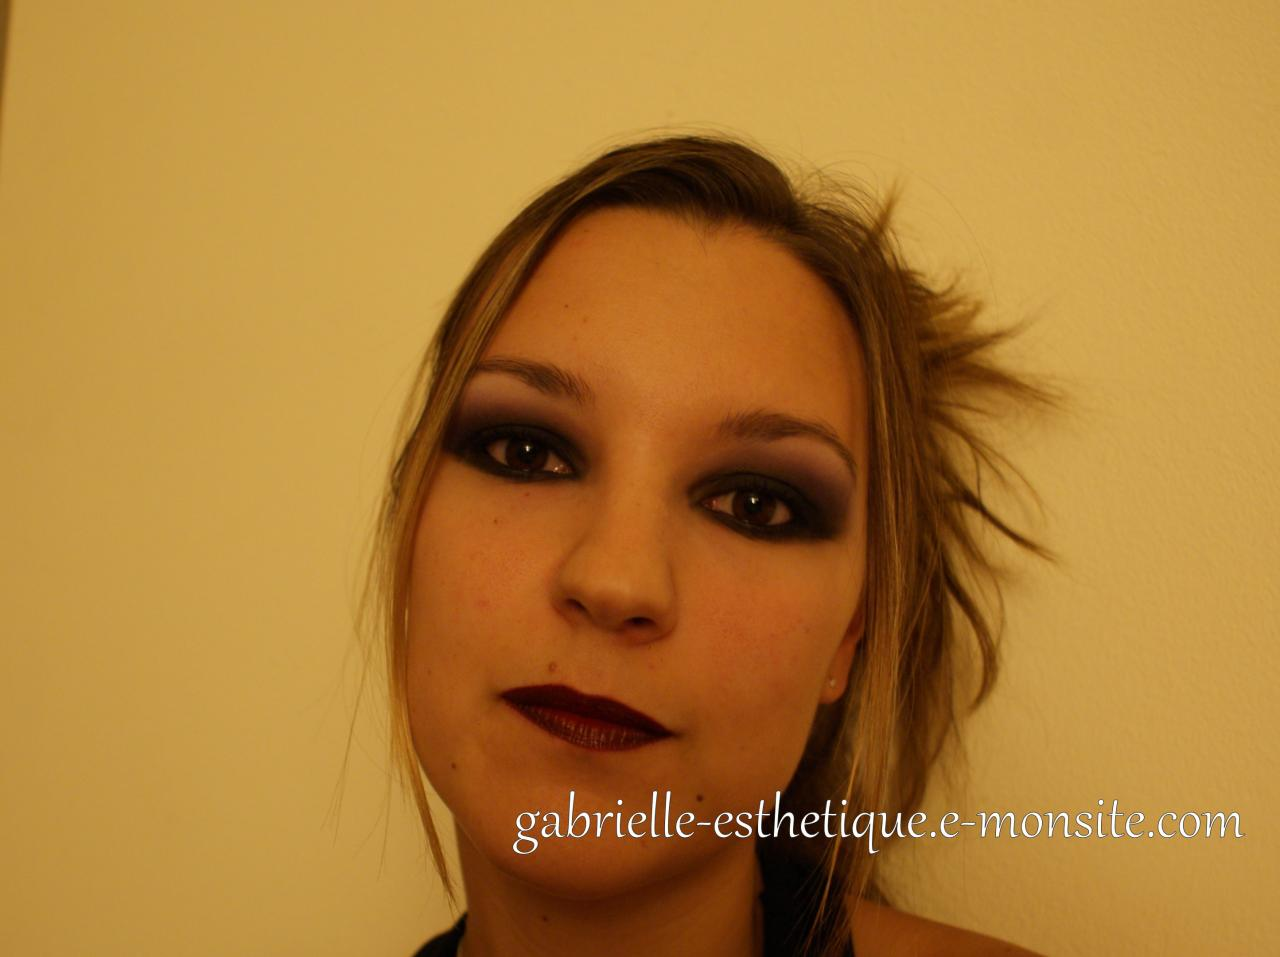 Gothic Look 4 (Halloween)